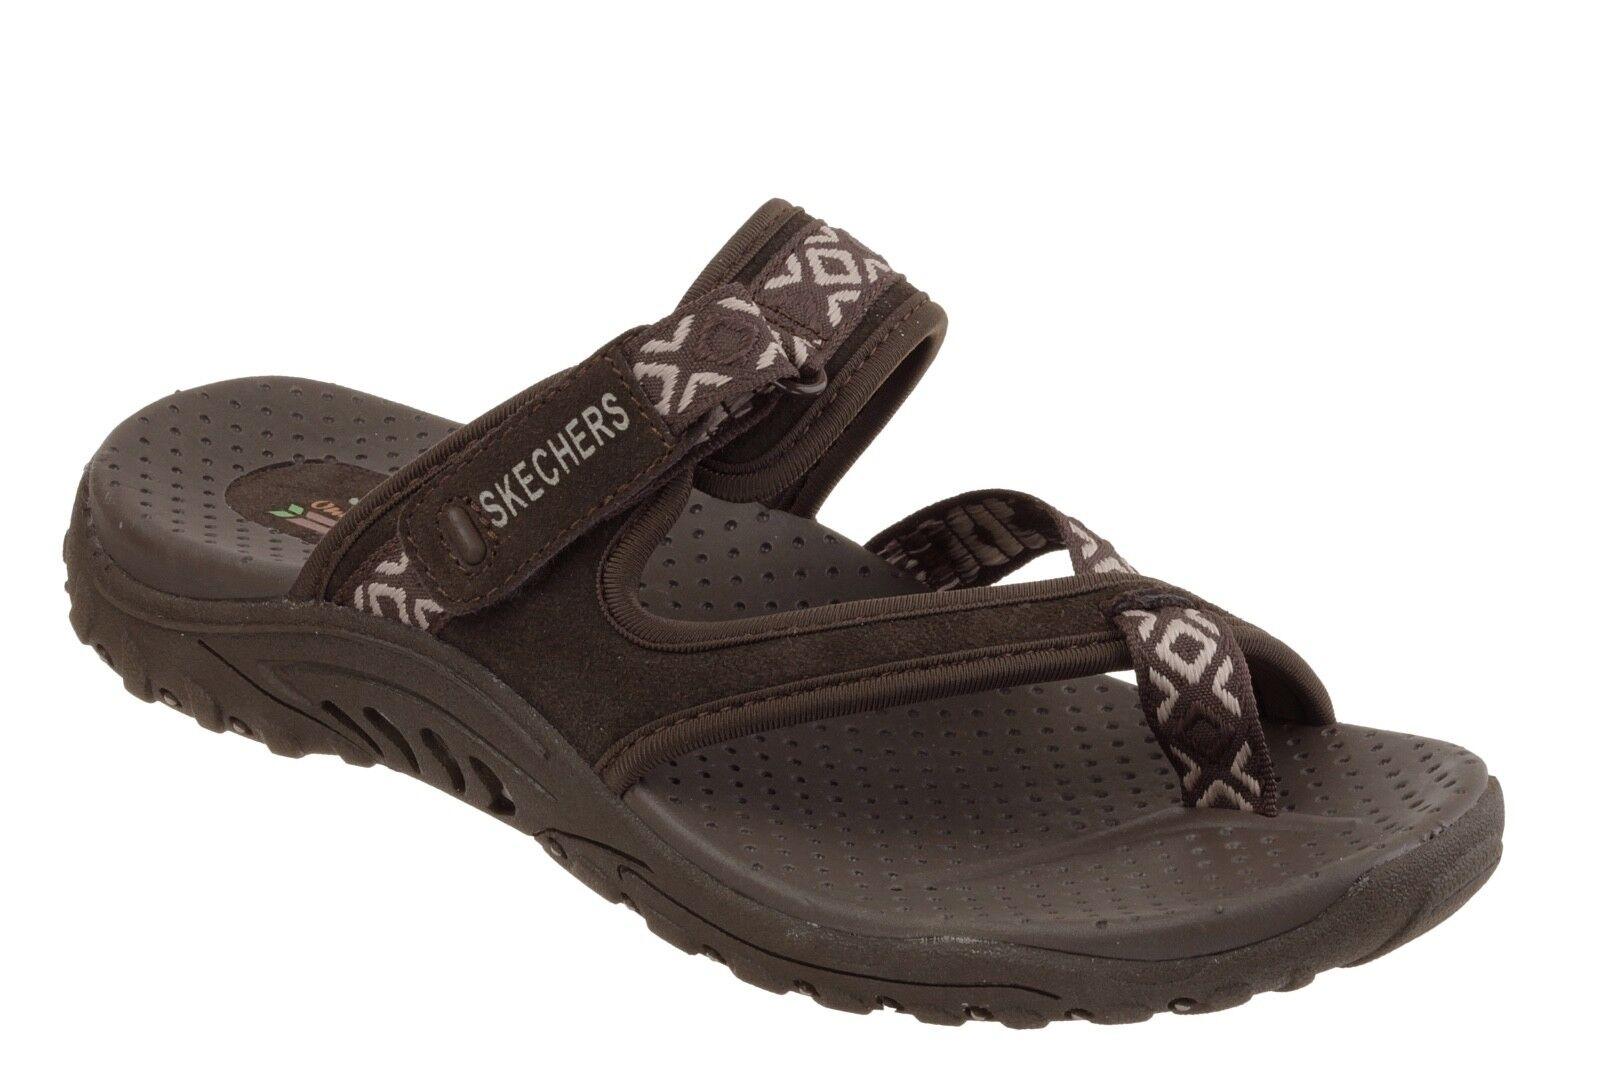 Skechers NEW Reggae Trailway Donna brown sporty comfort sandals Donna Trailway sizes 3-8 327053